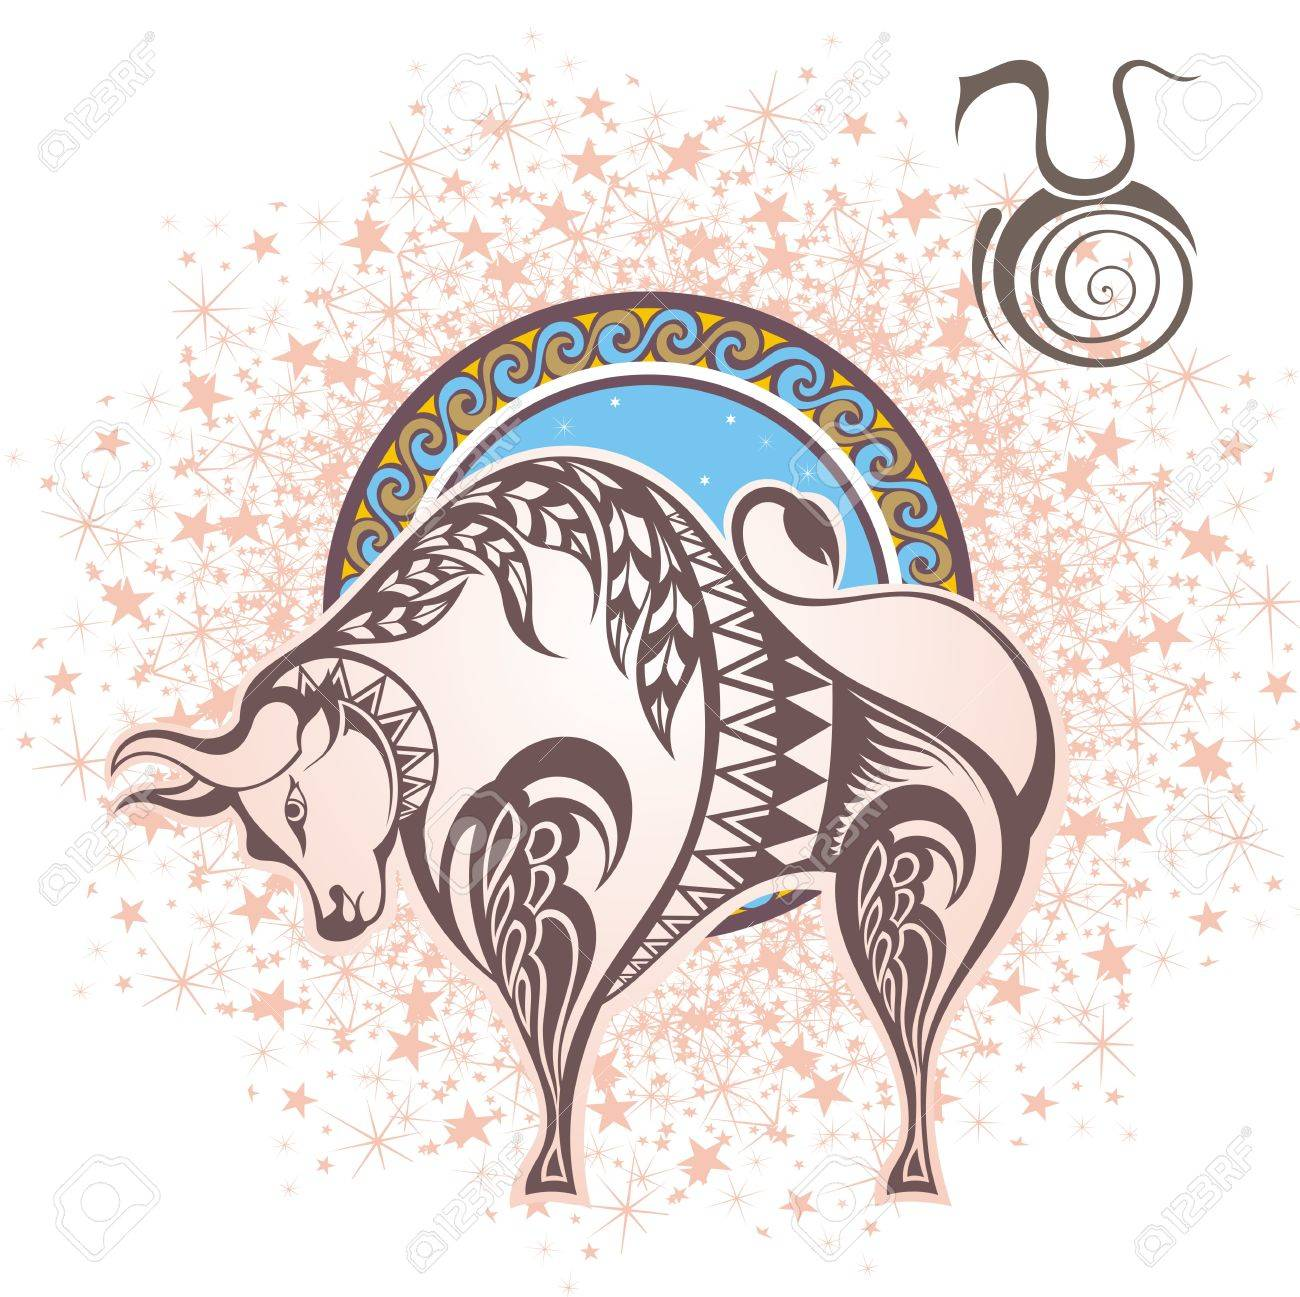 Taurus Zodiac Sign Royalty Free Cliparts Vectors And Stock